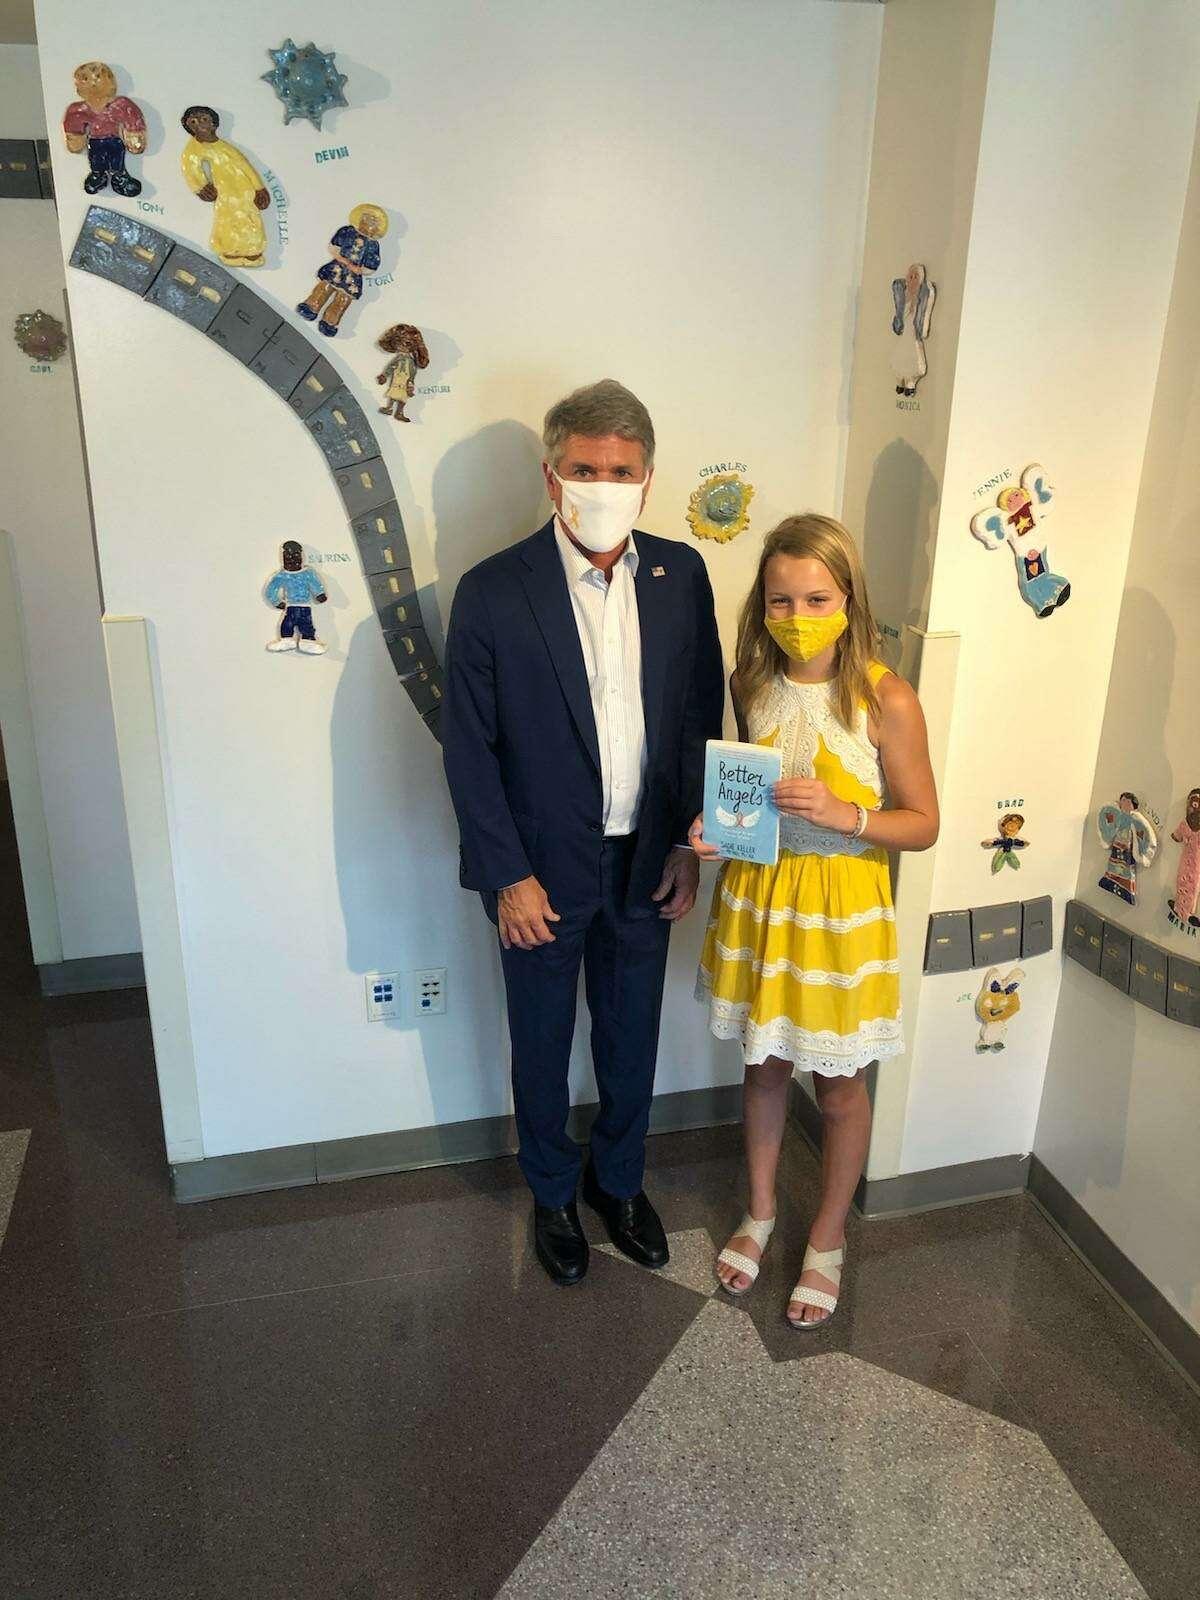 Congressman Michael McCaul and cancer survivor Sadie Keller visit Texas Children's Hospital to distribute signed copies of Keller's book,